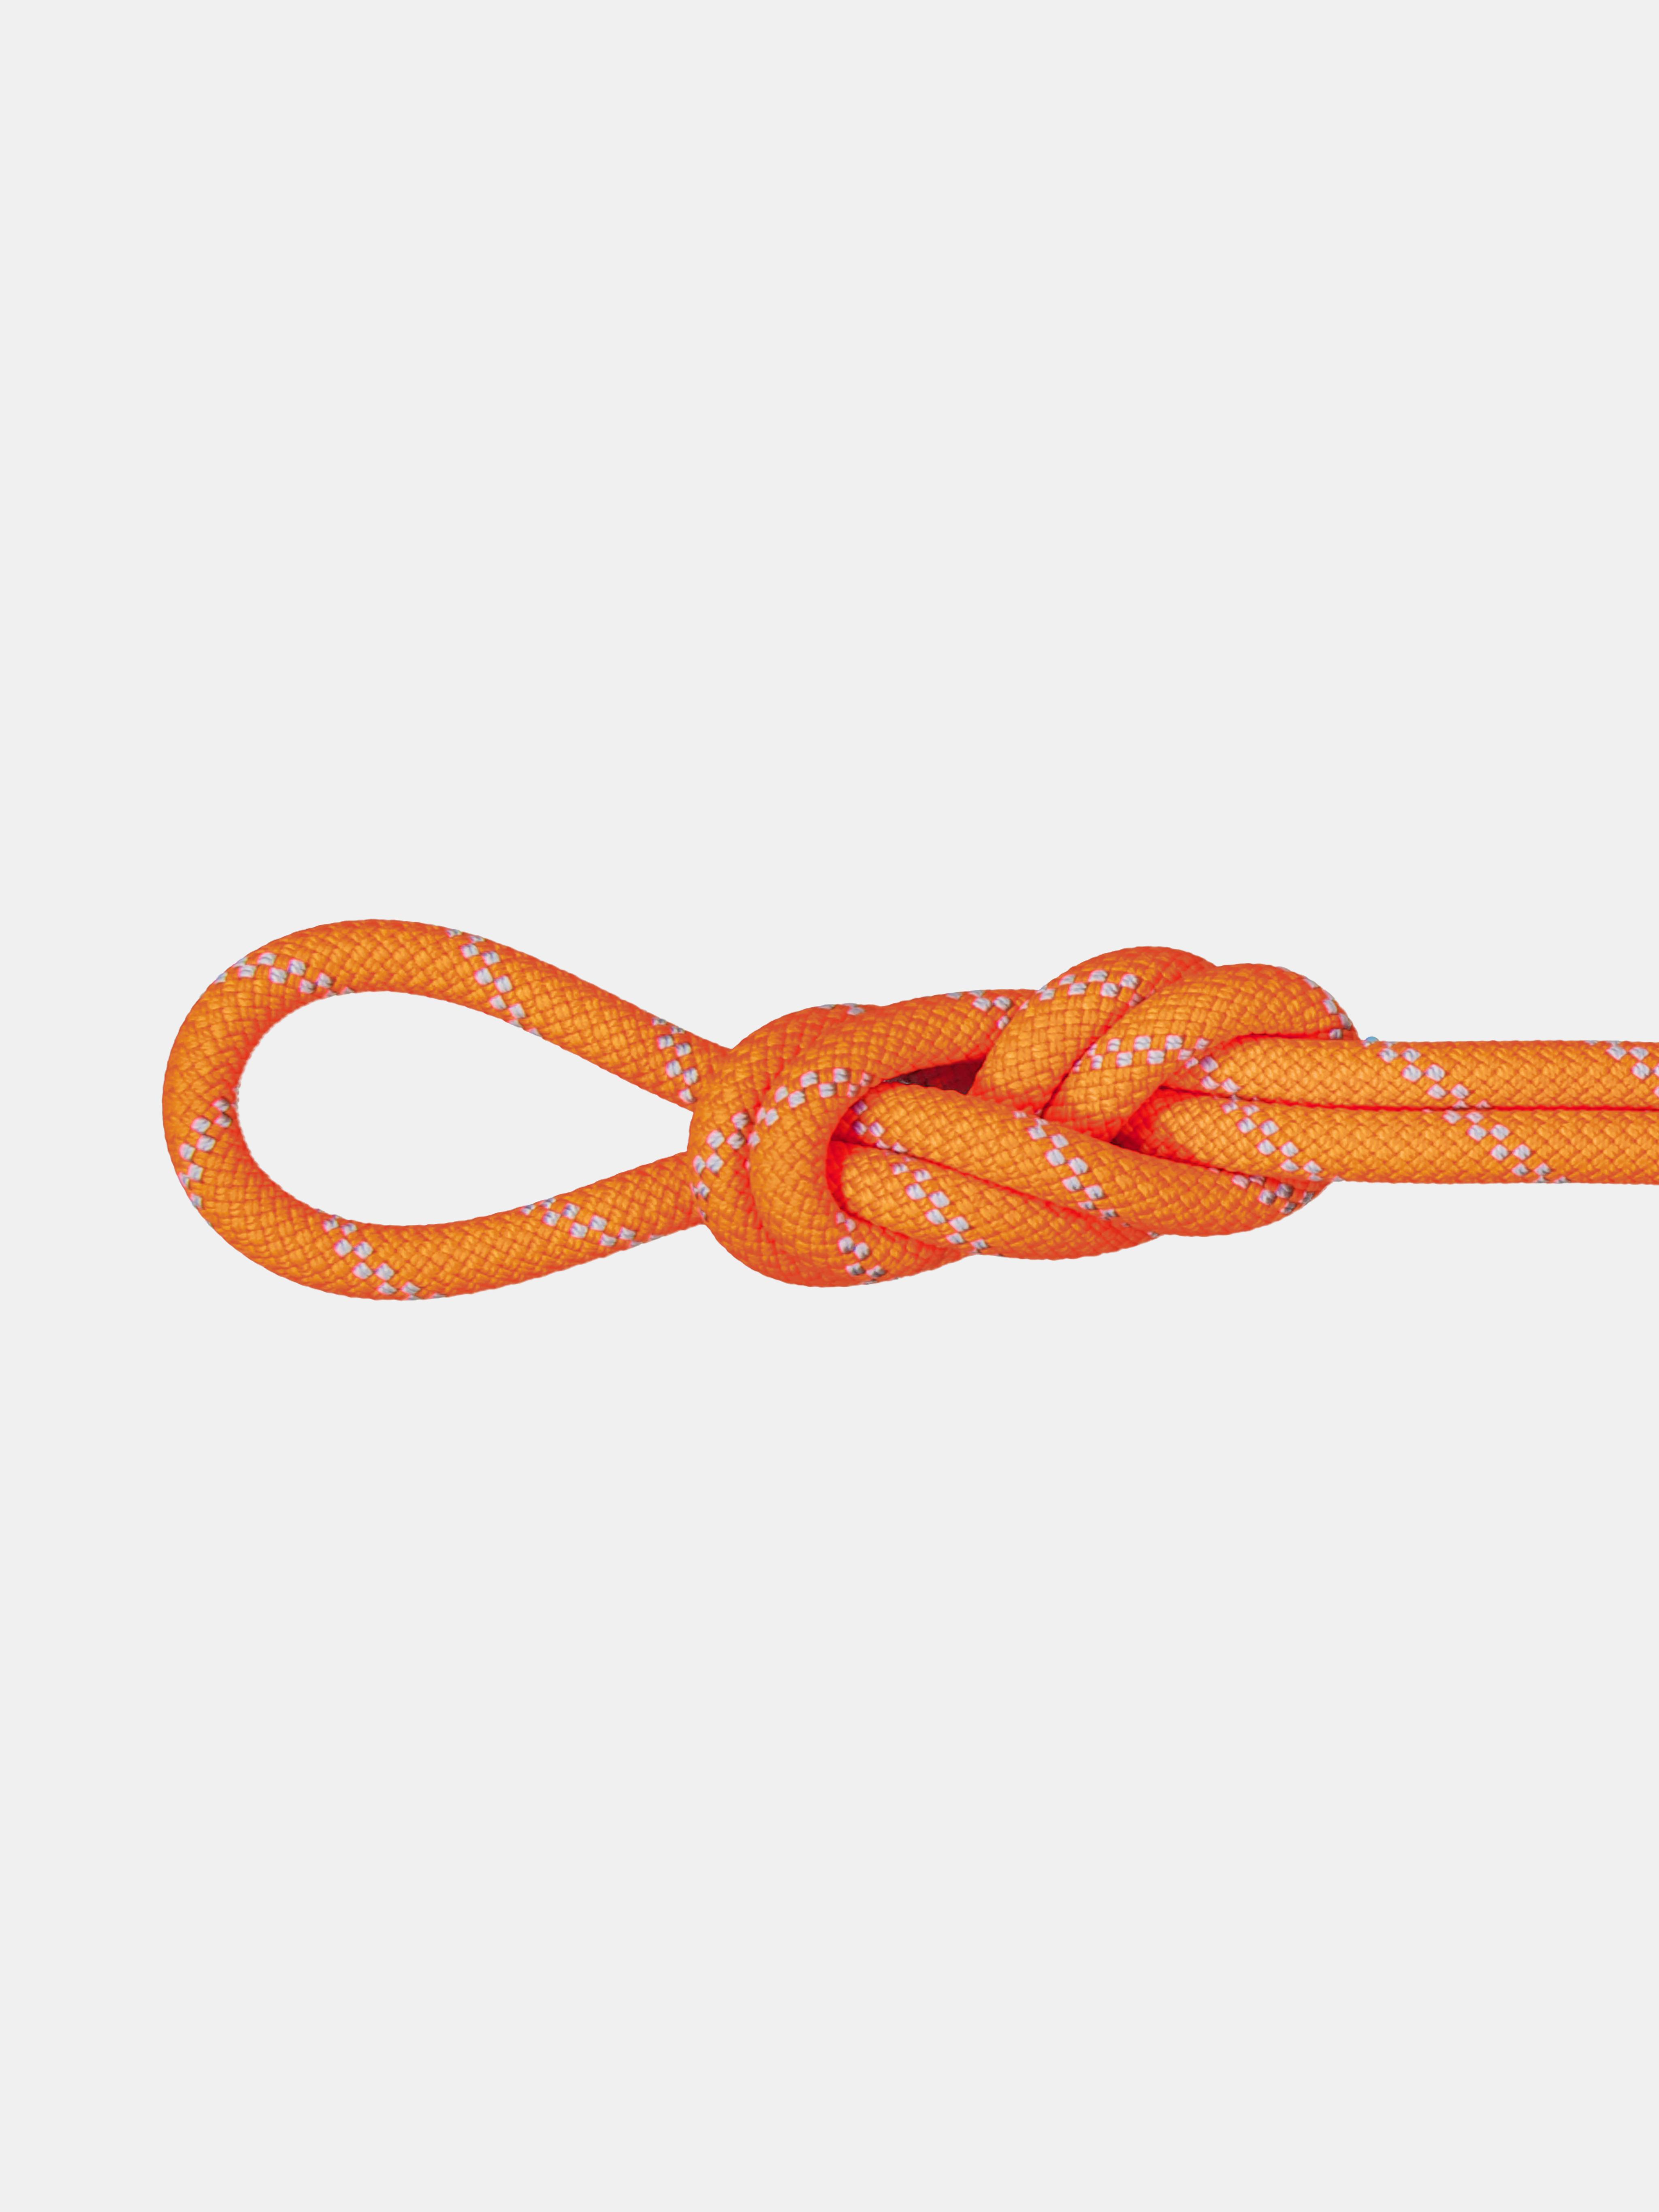 9.5 Alpine Dry Rope thumbnail